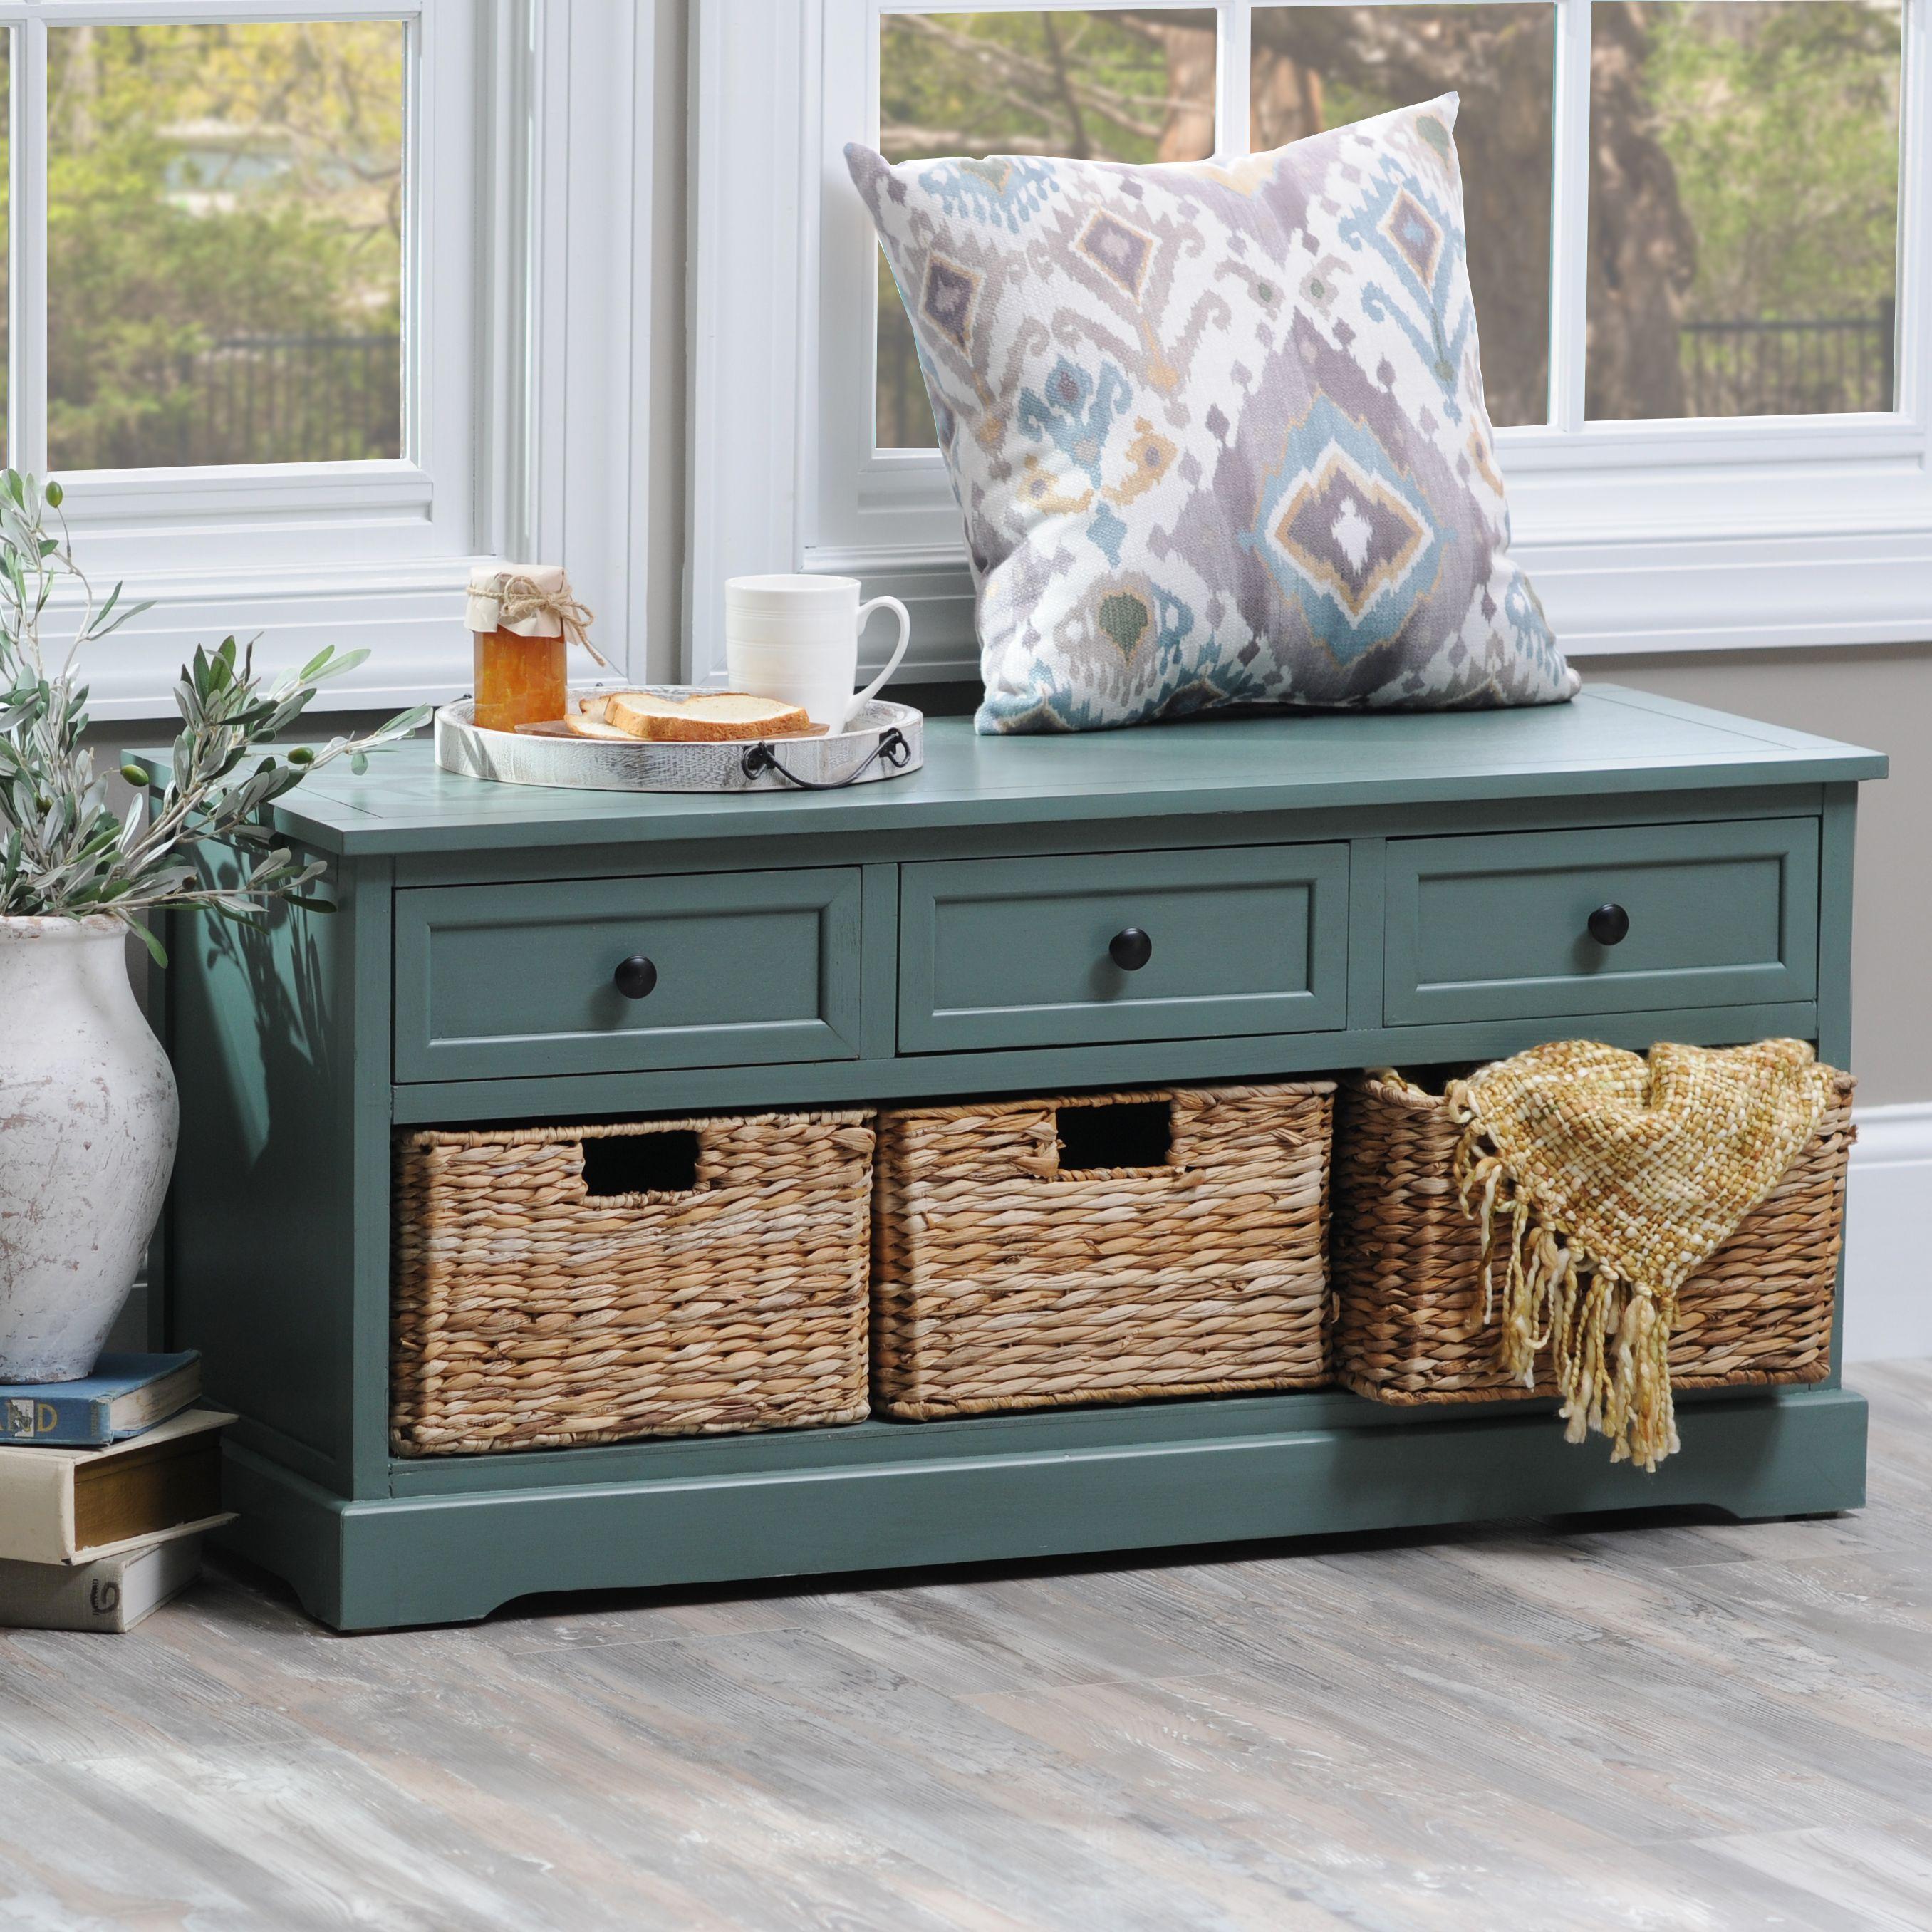 Blue 6 Drawer Storage Bench With Baskets